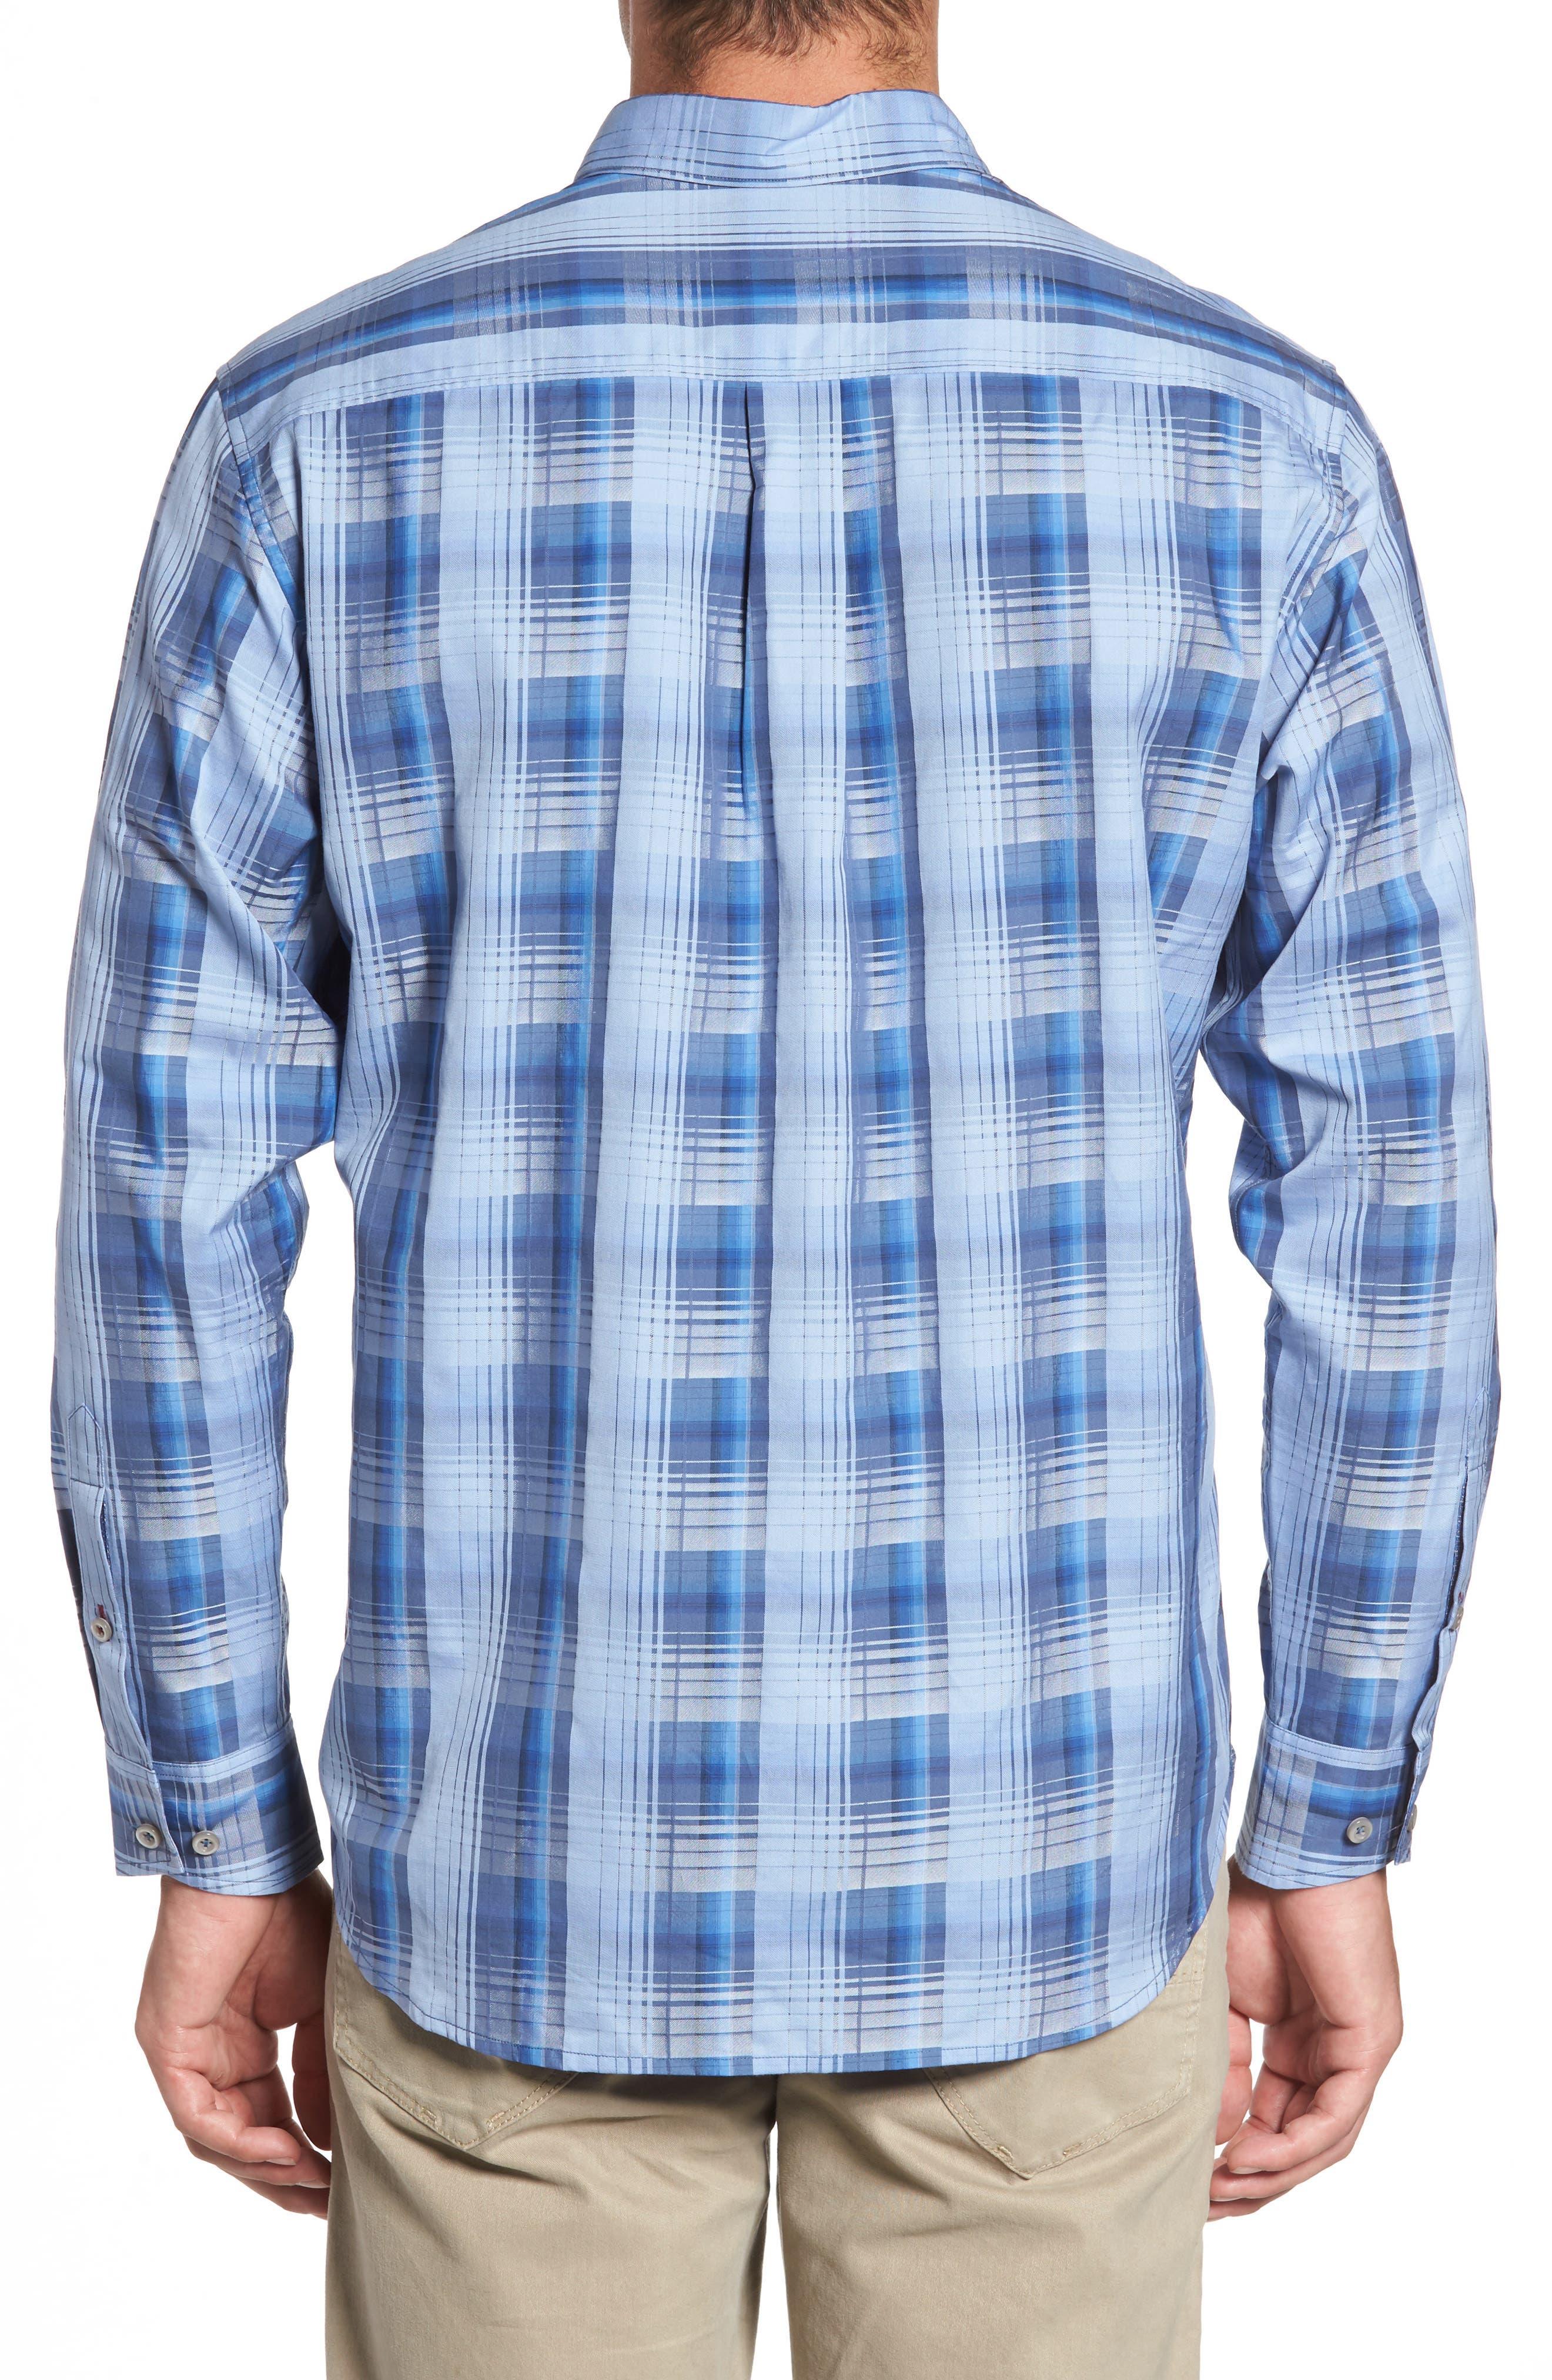 Alternate Image 2  - Tommy Bahama Shadow Ridge Check Cotton & Silk Sport Shirt (Big & Tall)